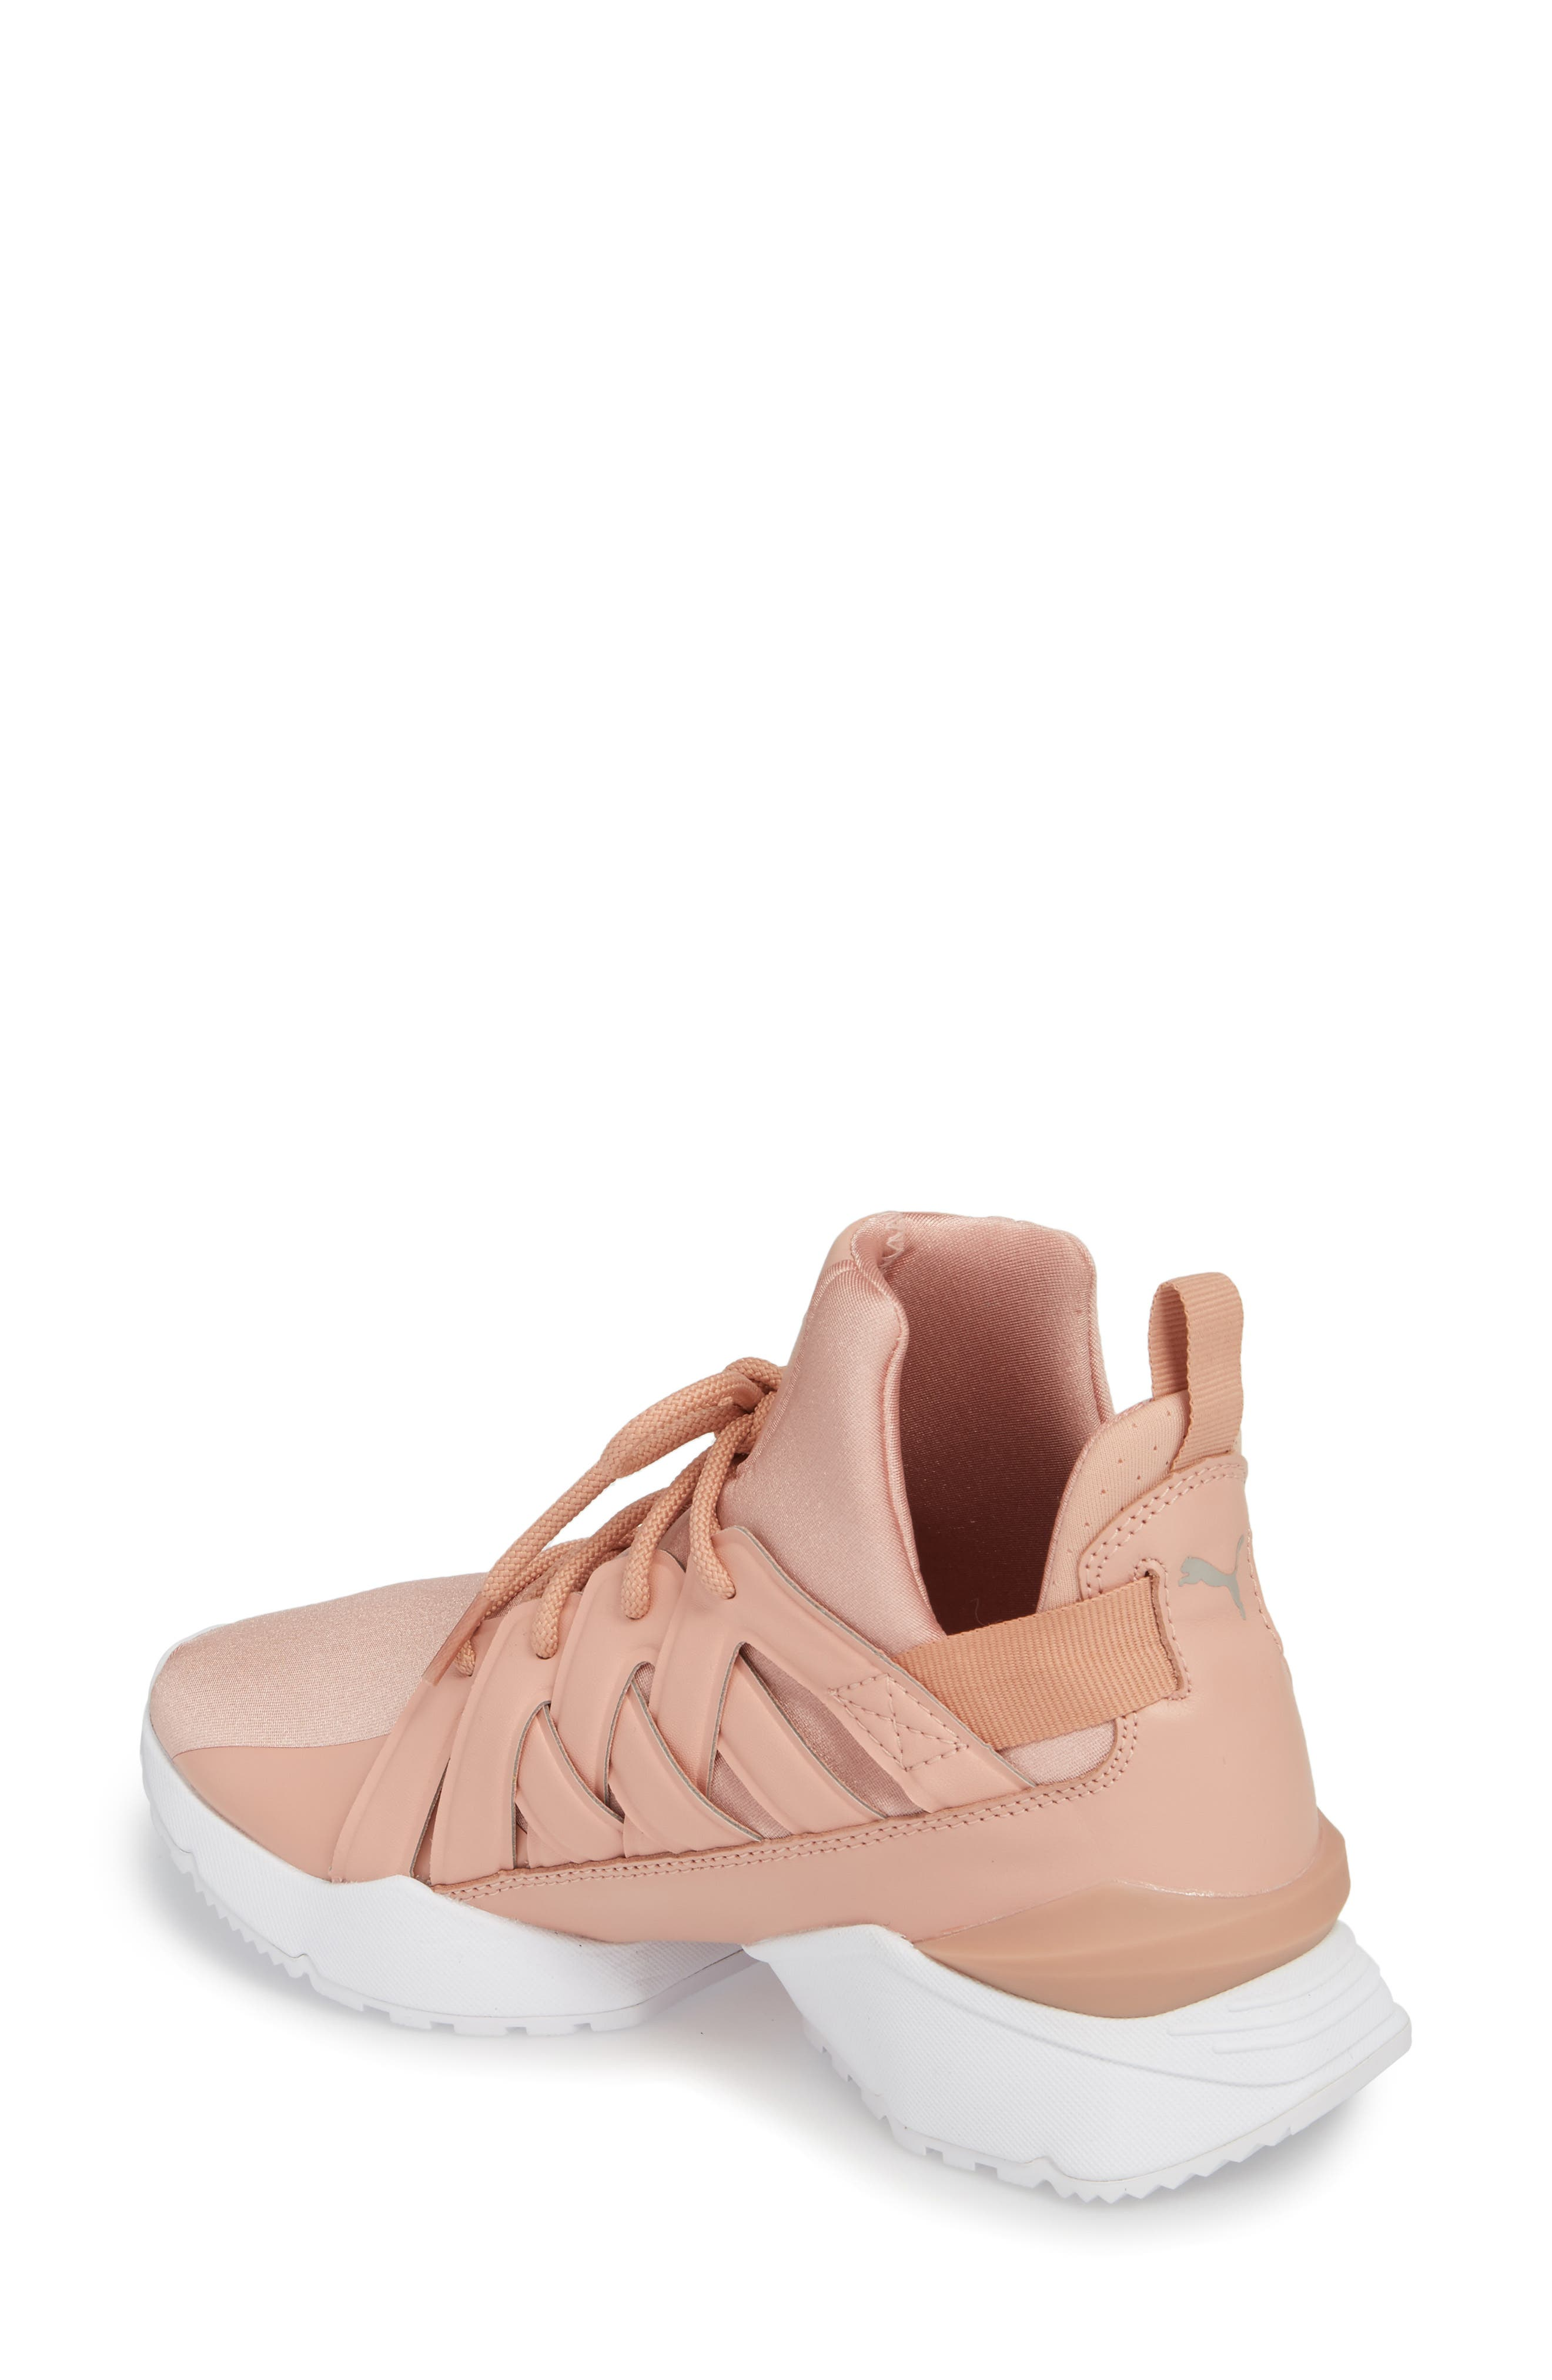 Muse Echo Satin En Pointe High Top Sneaker,                             Alternate thumbnail 4, color,